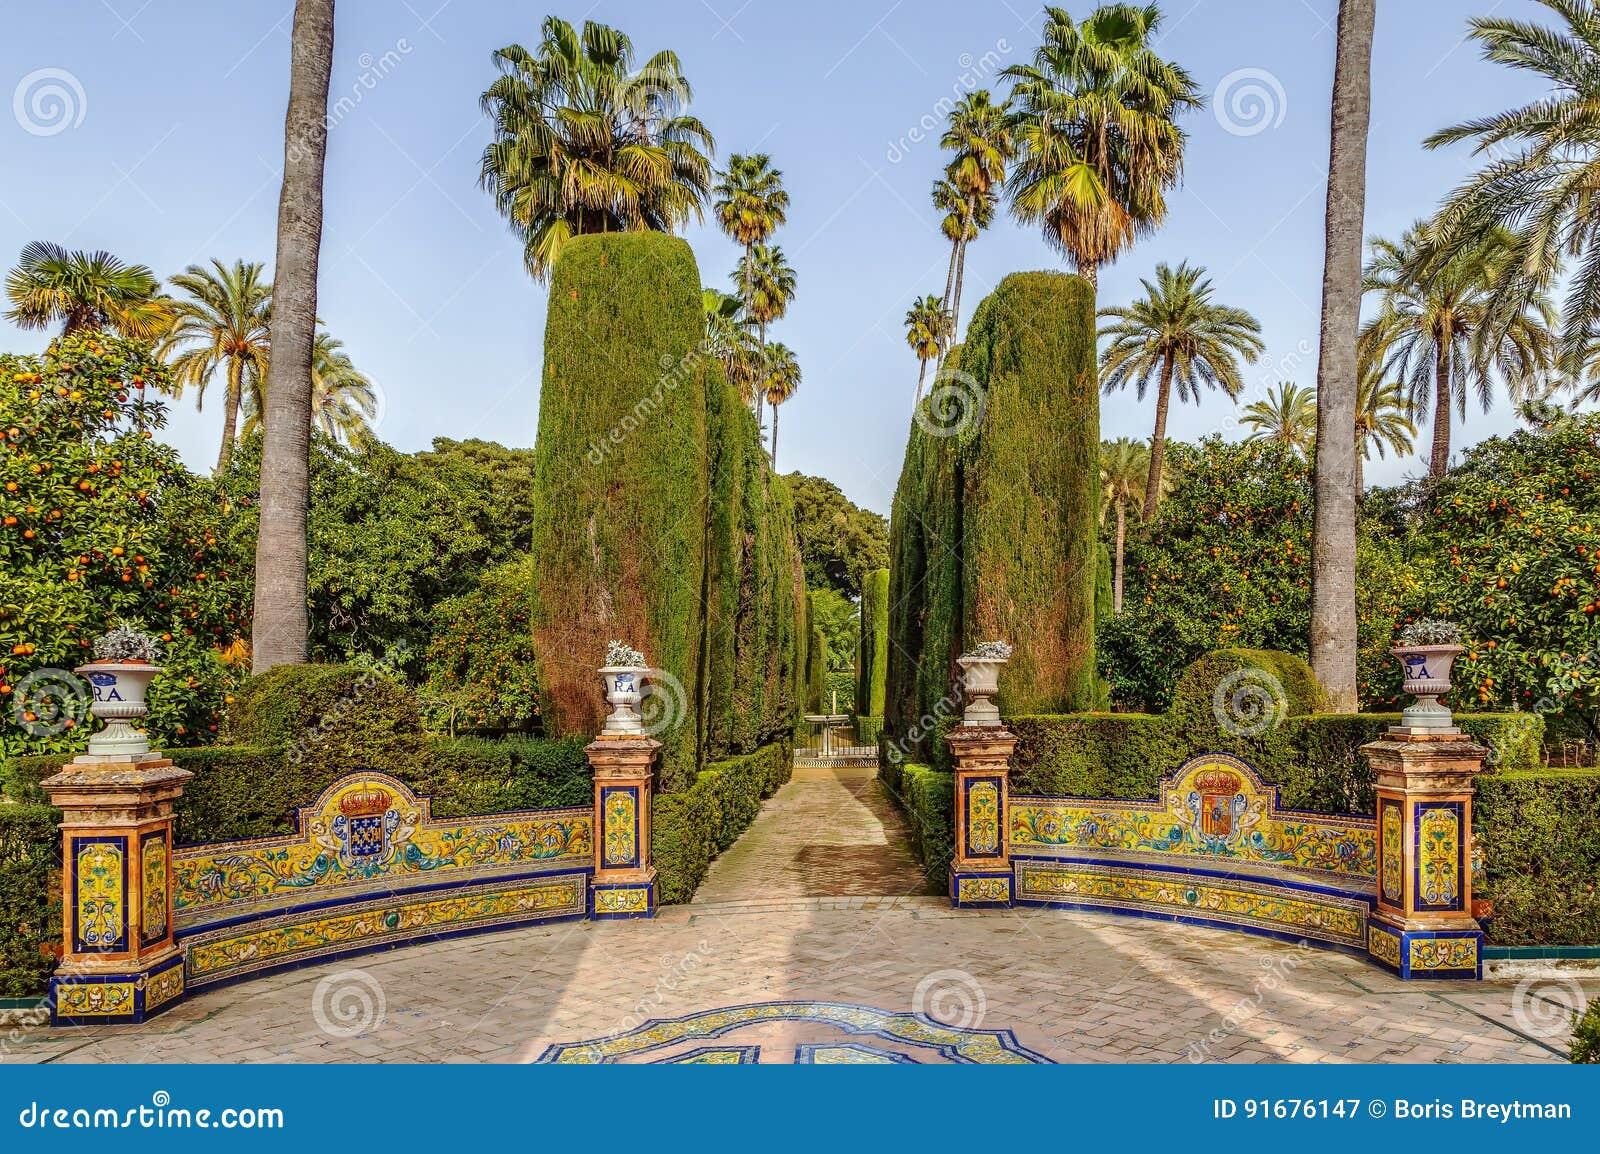 Garden In Alcazar Of Seville, Spain Stock Image - Image of gardens ...